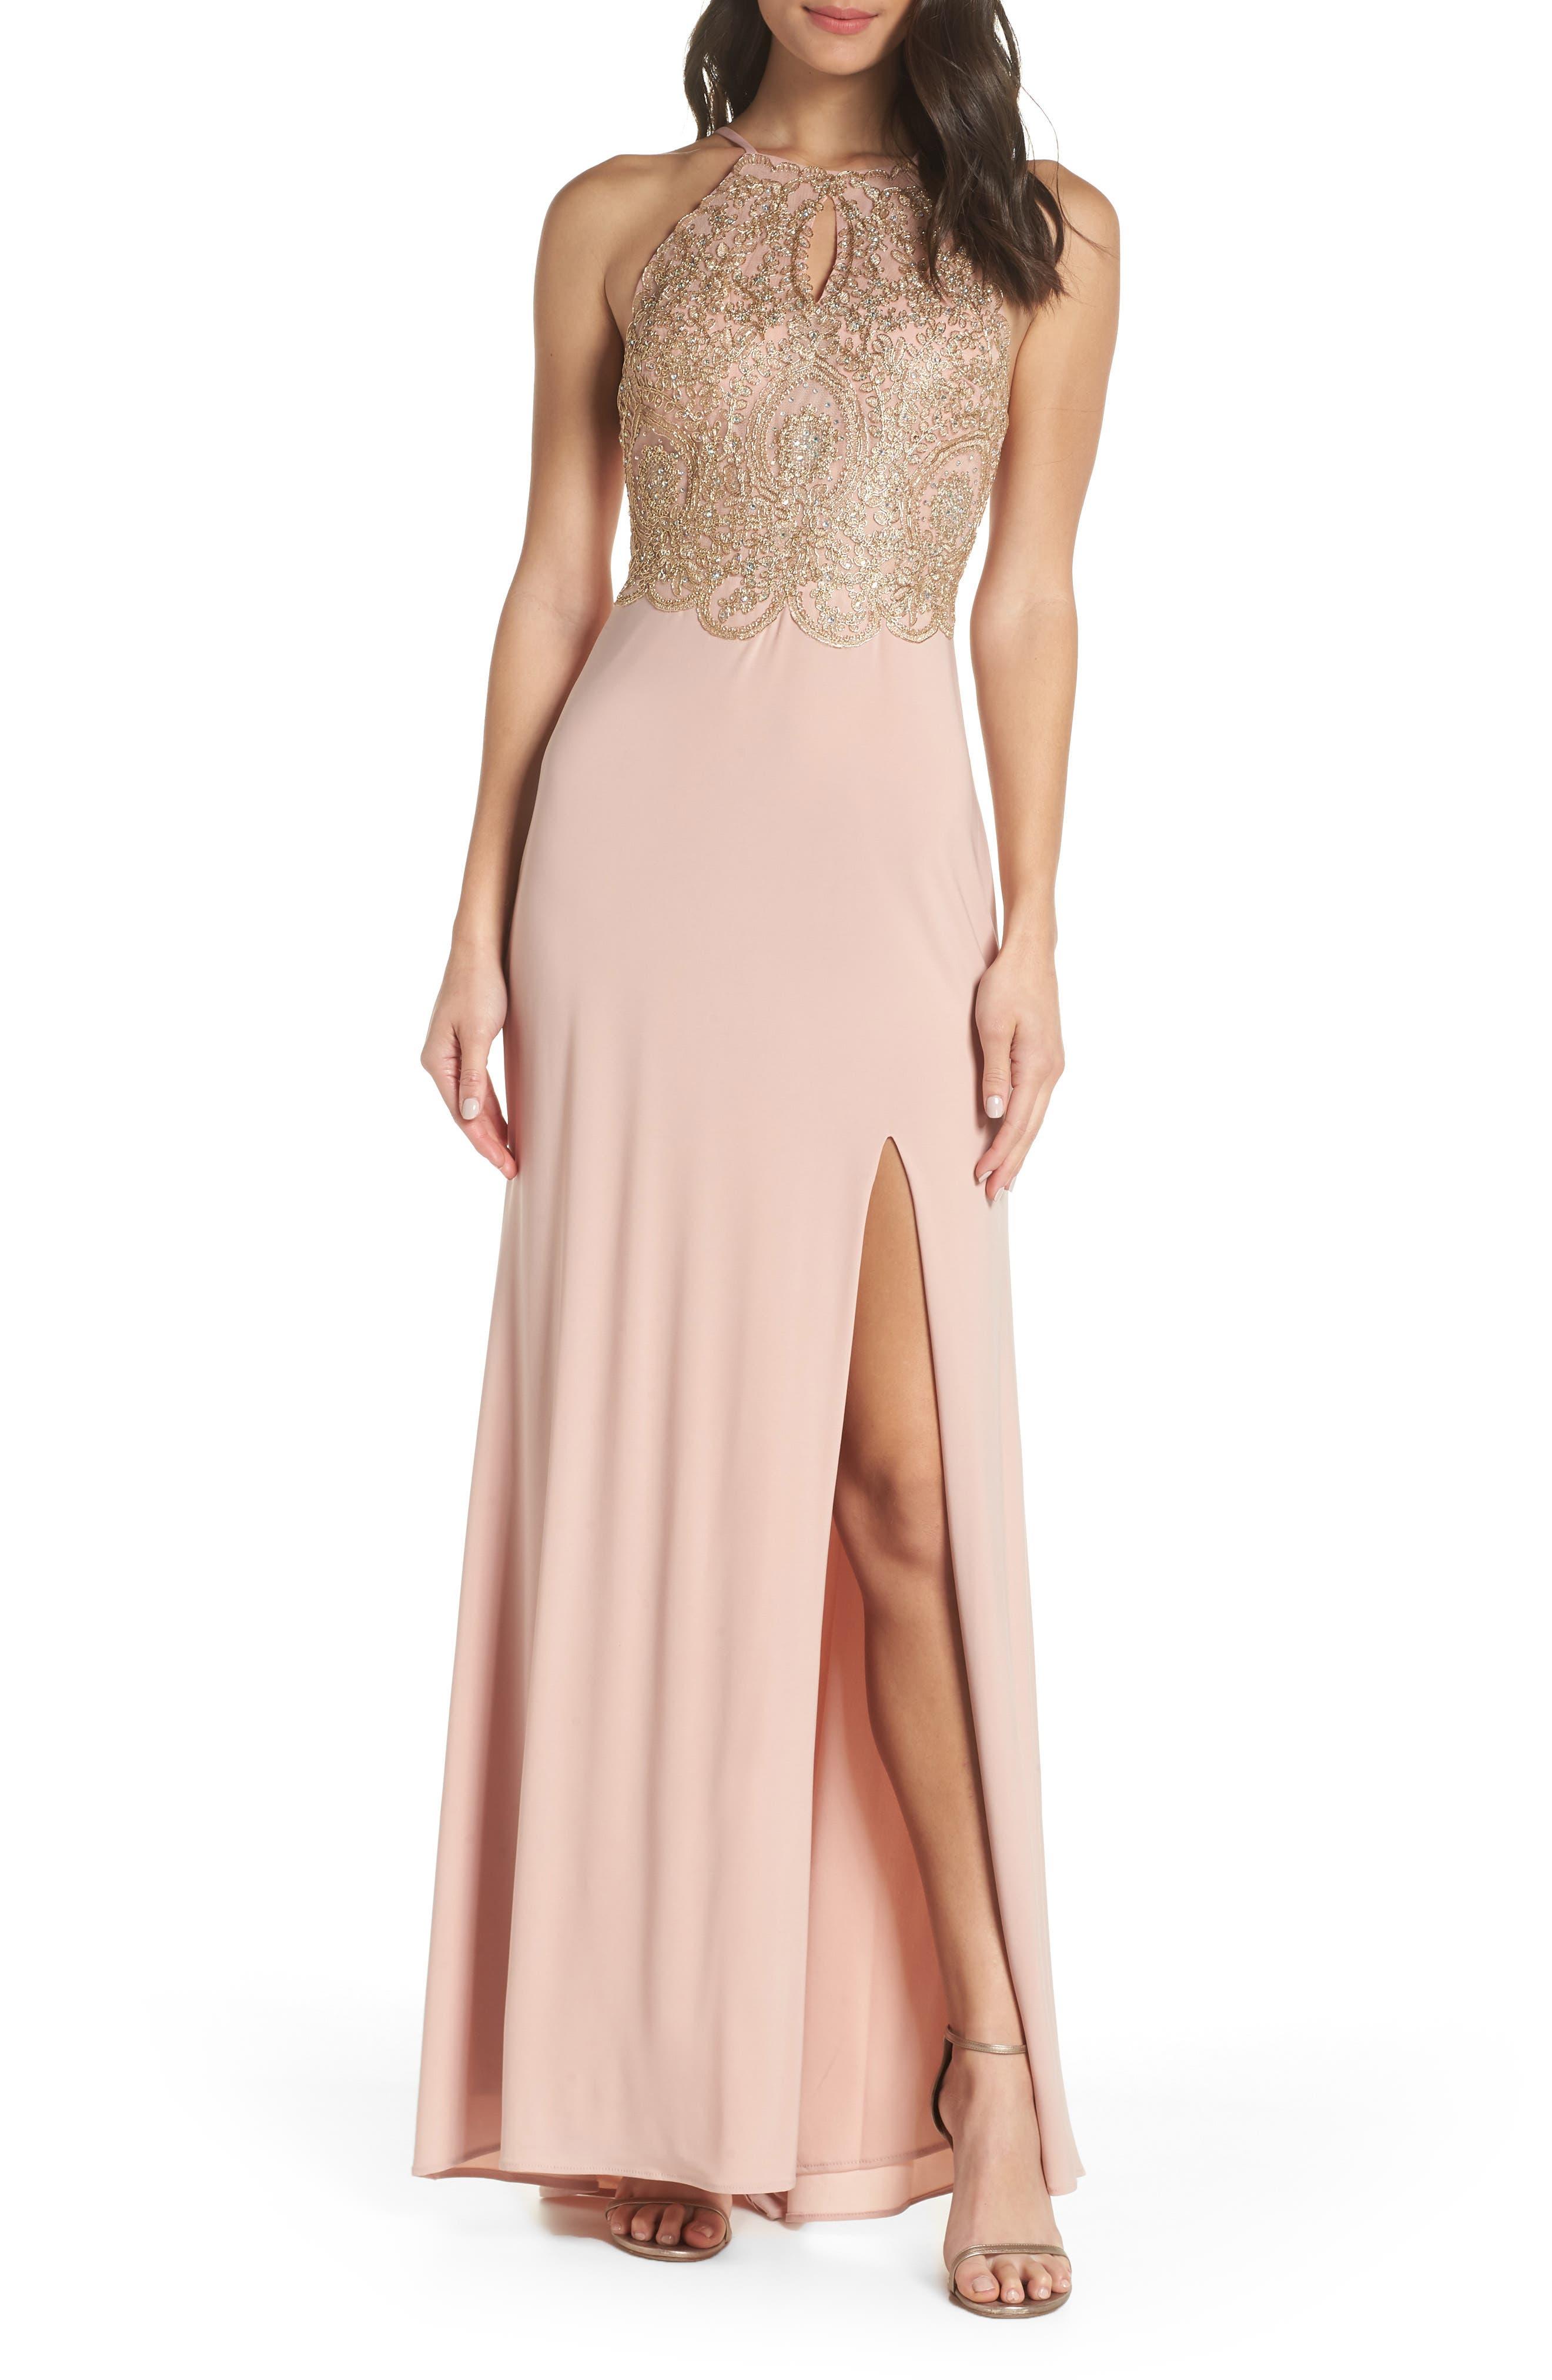 Blondie Nites Embellished Applique Halter Gown, Pink